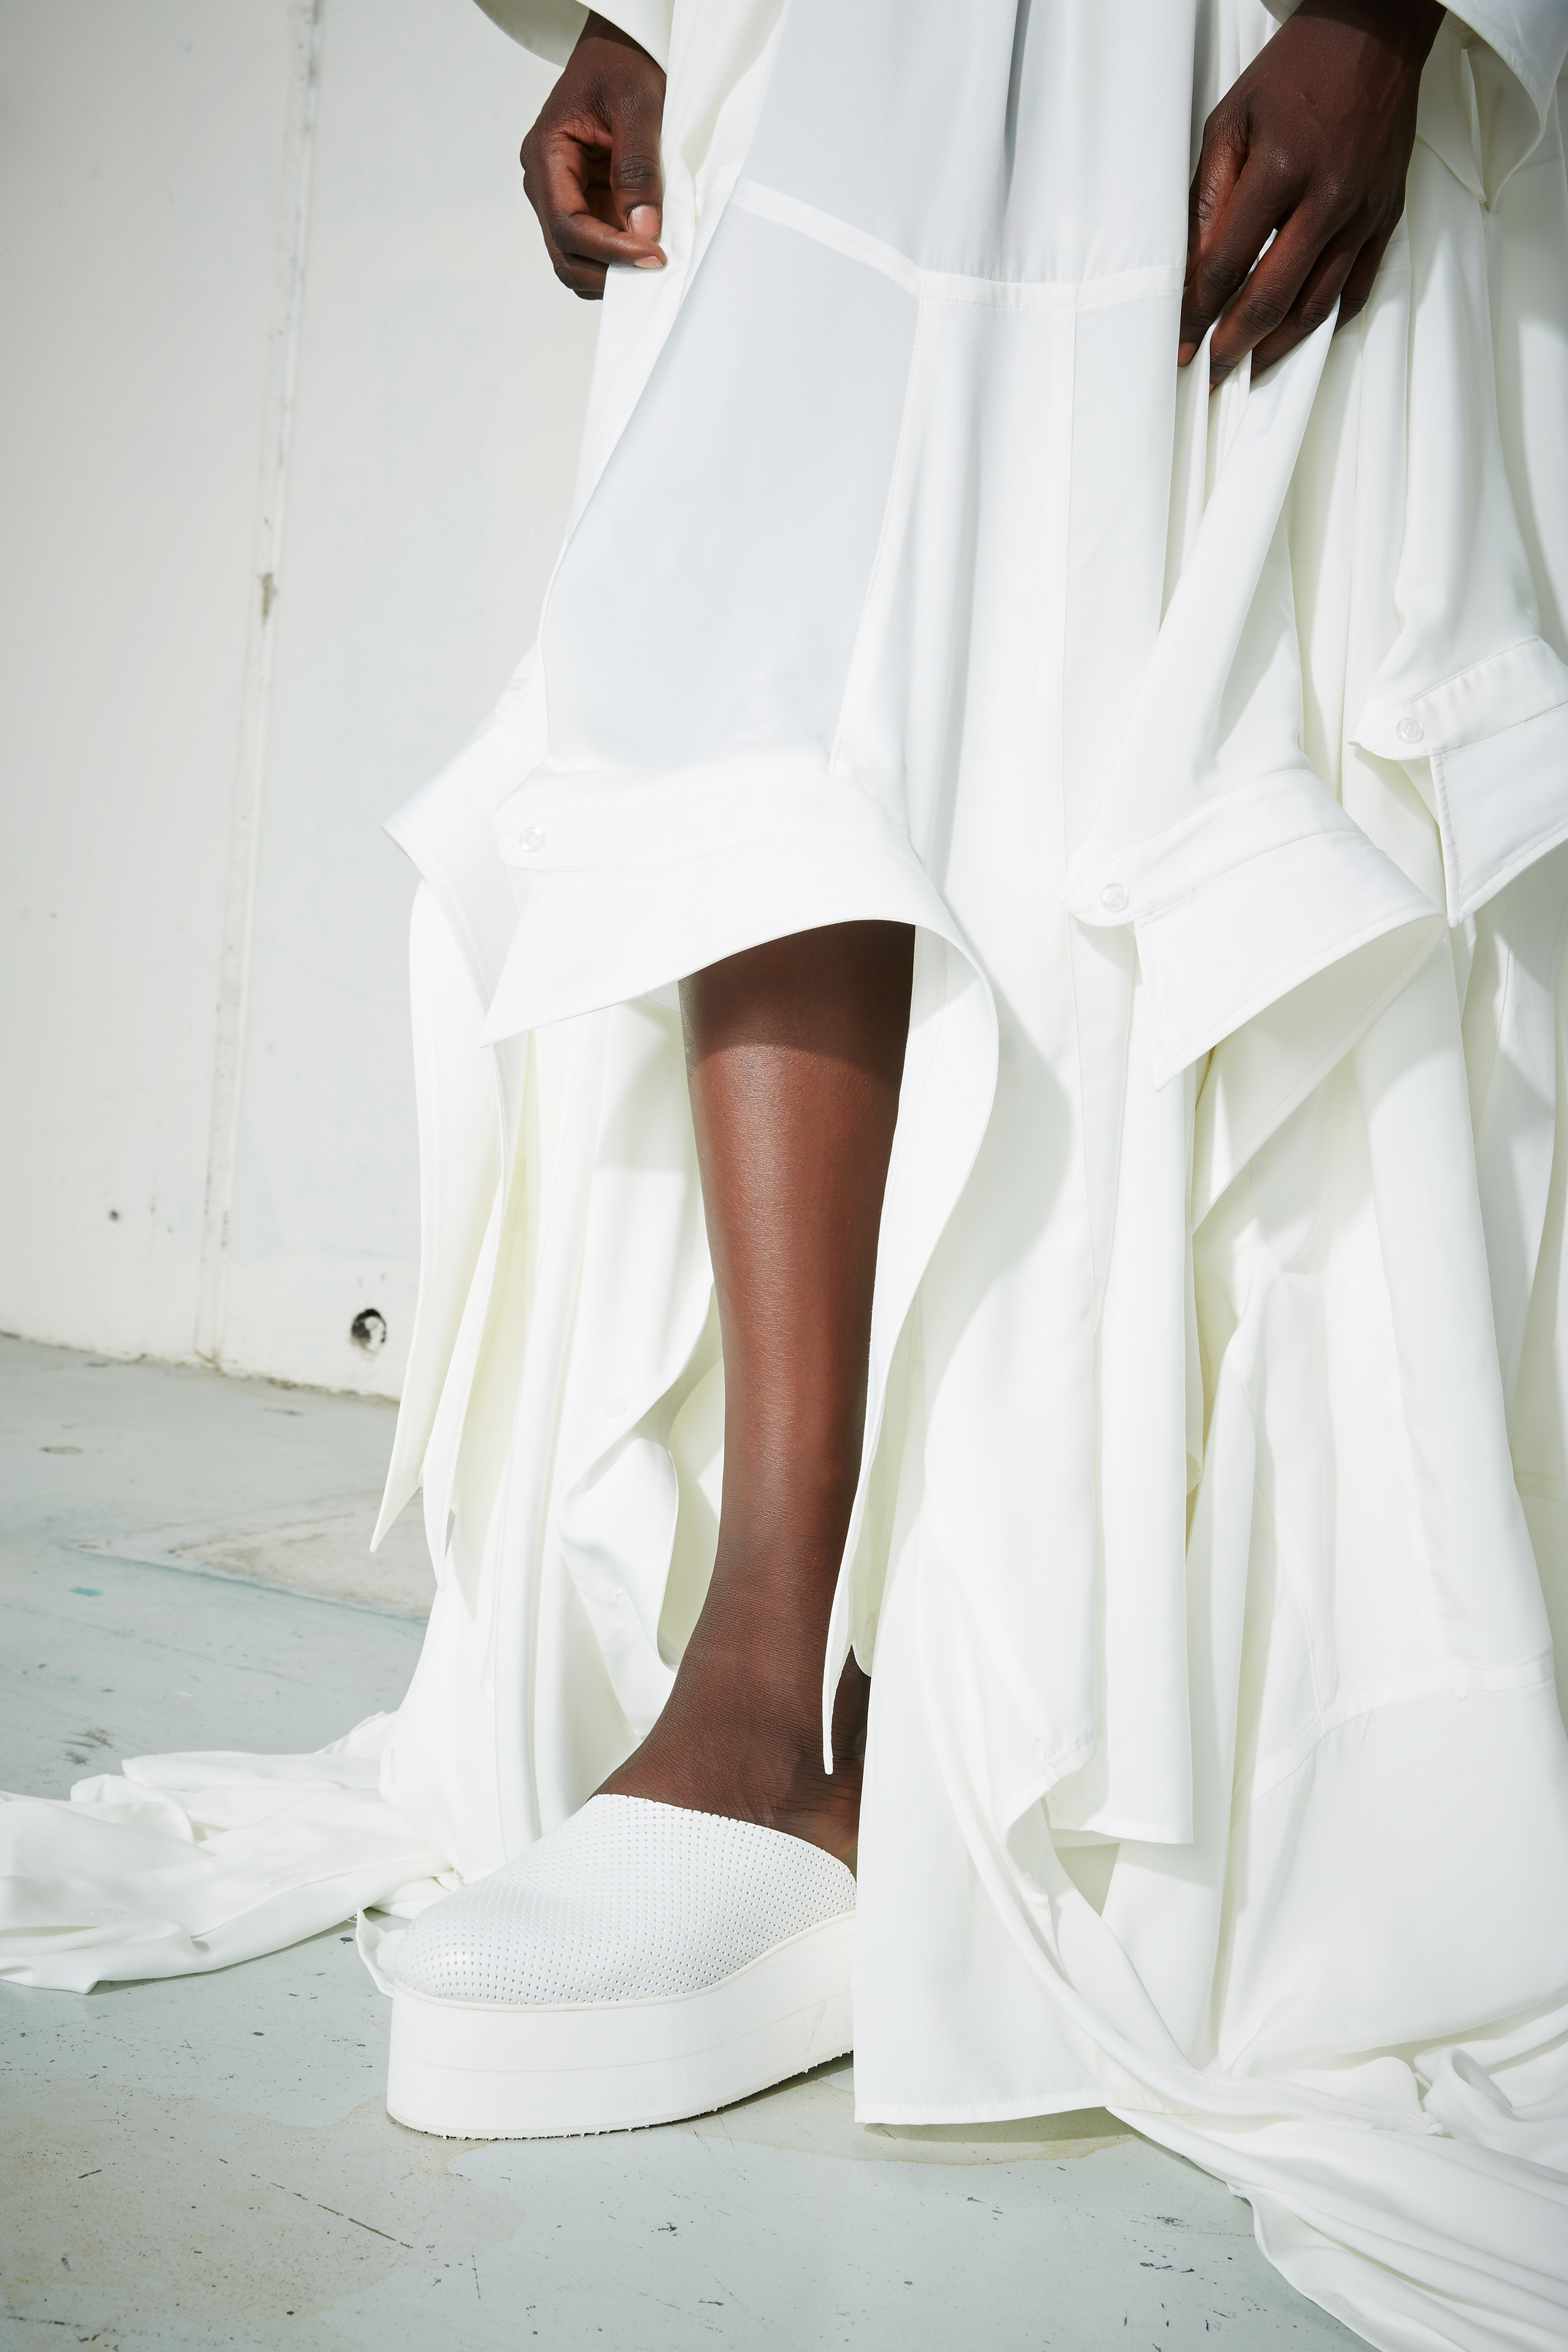 Paul Castro Sustainable Fashion Design